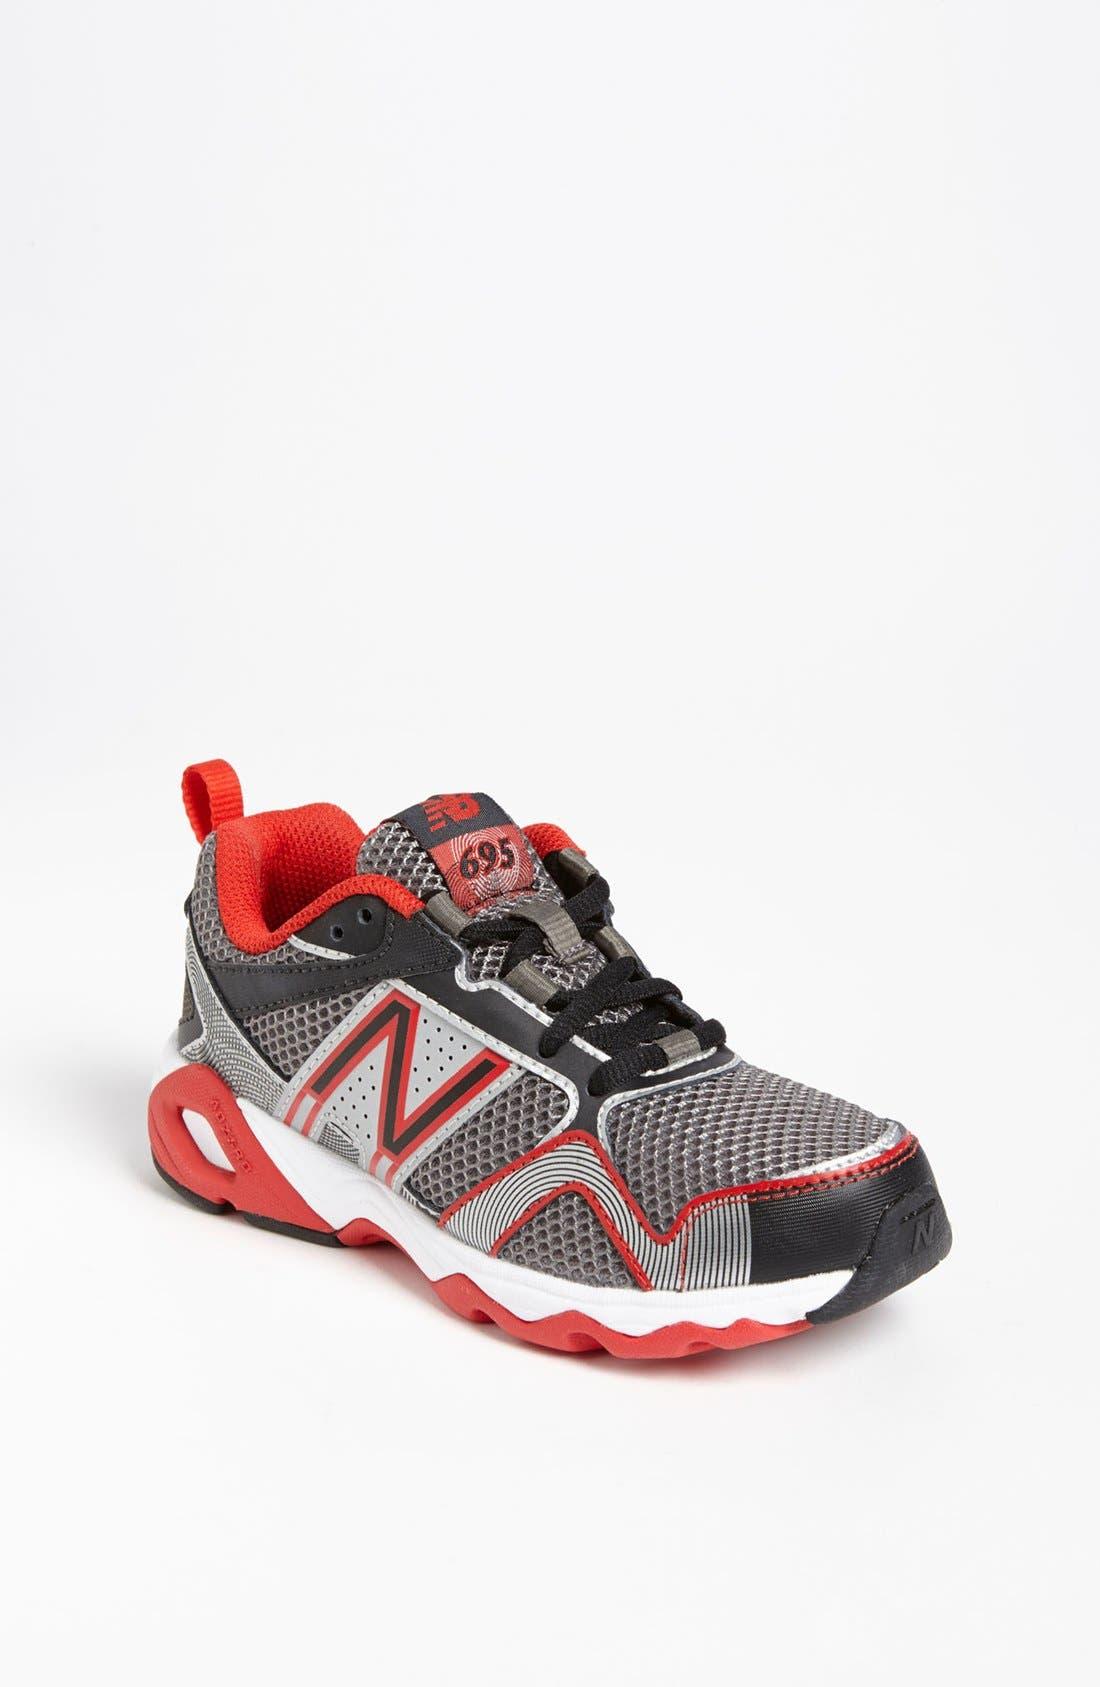 Main Image - New Balance '695' Sneaker (Toddler, Little Kid & Big Kid) (Online Only)